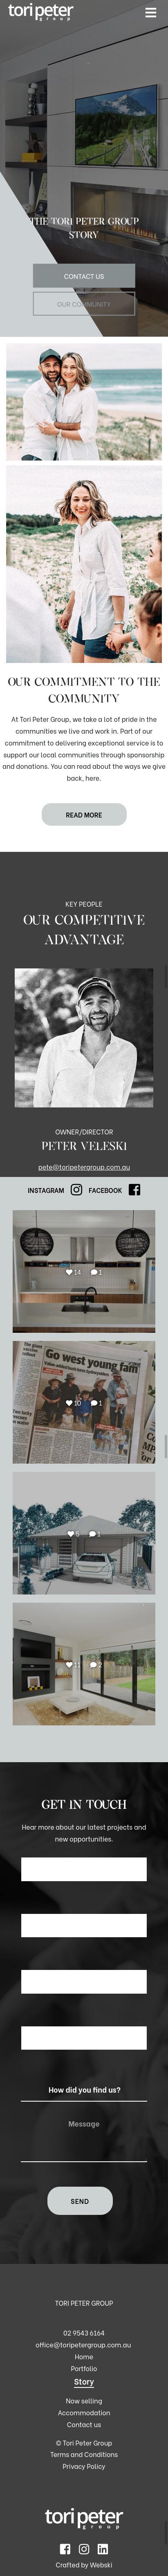 web-design-home-builders